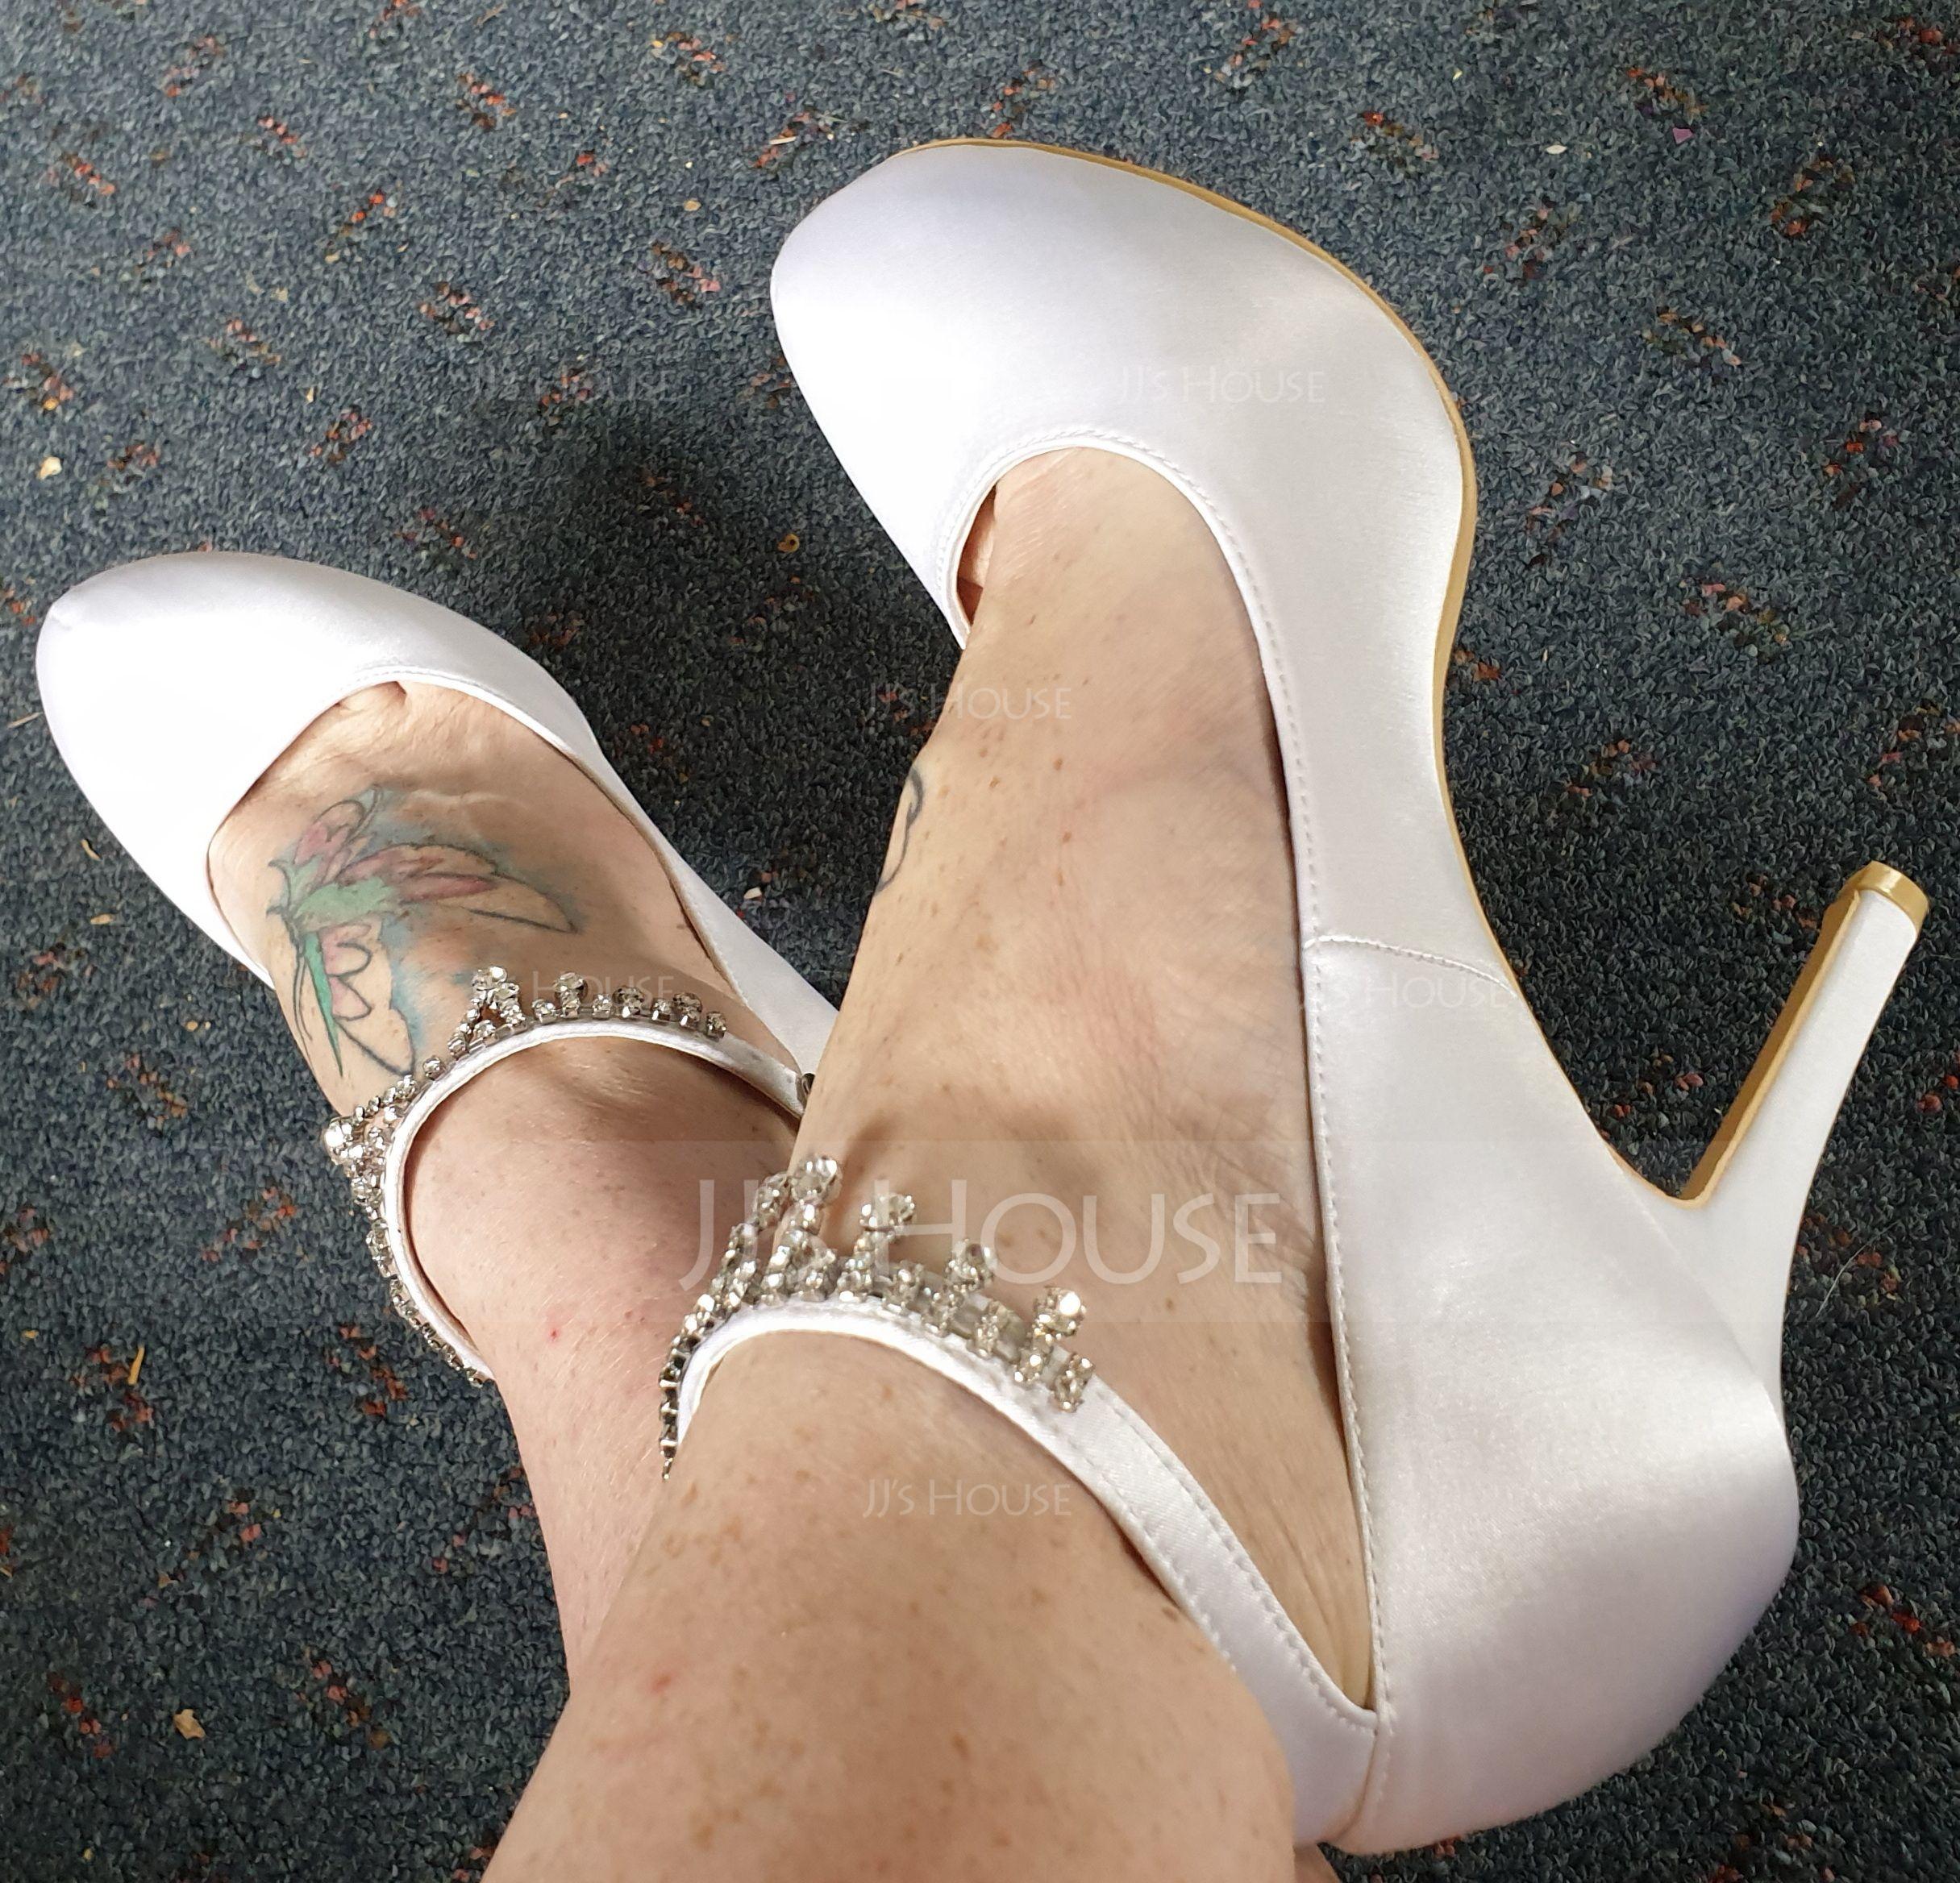 Women's Satin Stiletto Heel Closed Toe Pumps With Rhinestone Tassel (047057099)